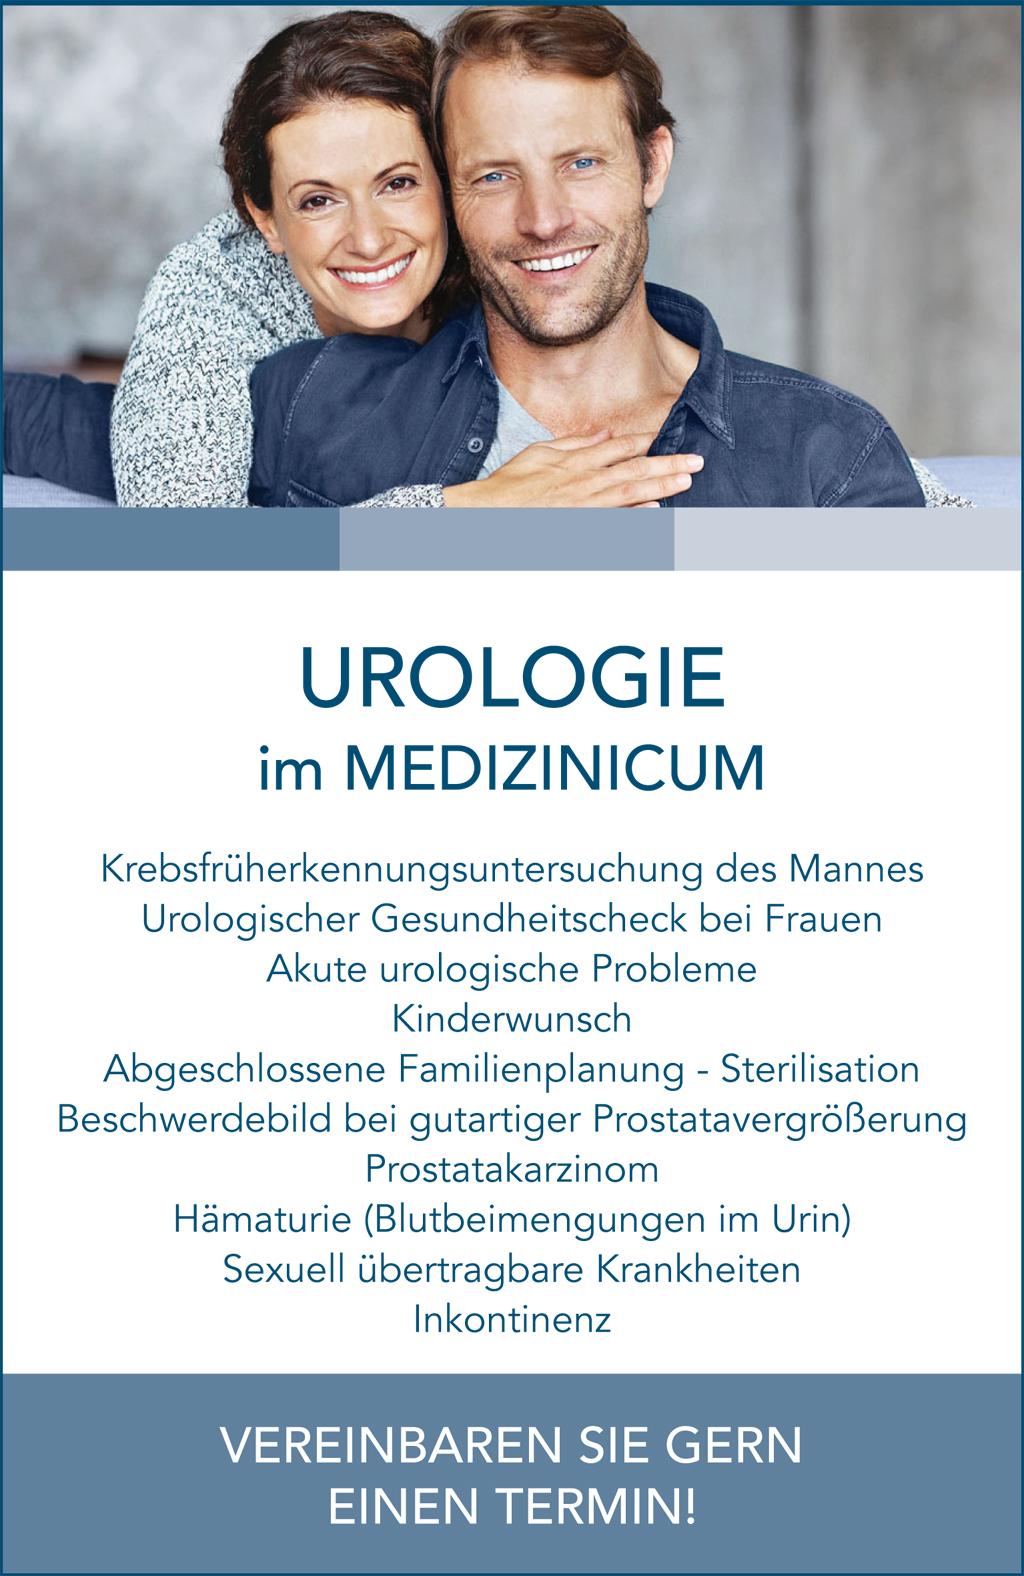 Urologie PopUp Hinweis - MEDIZINICUM Hamburg